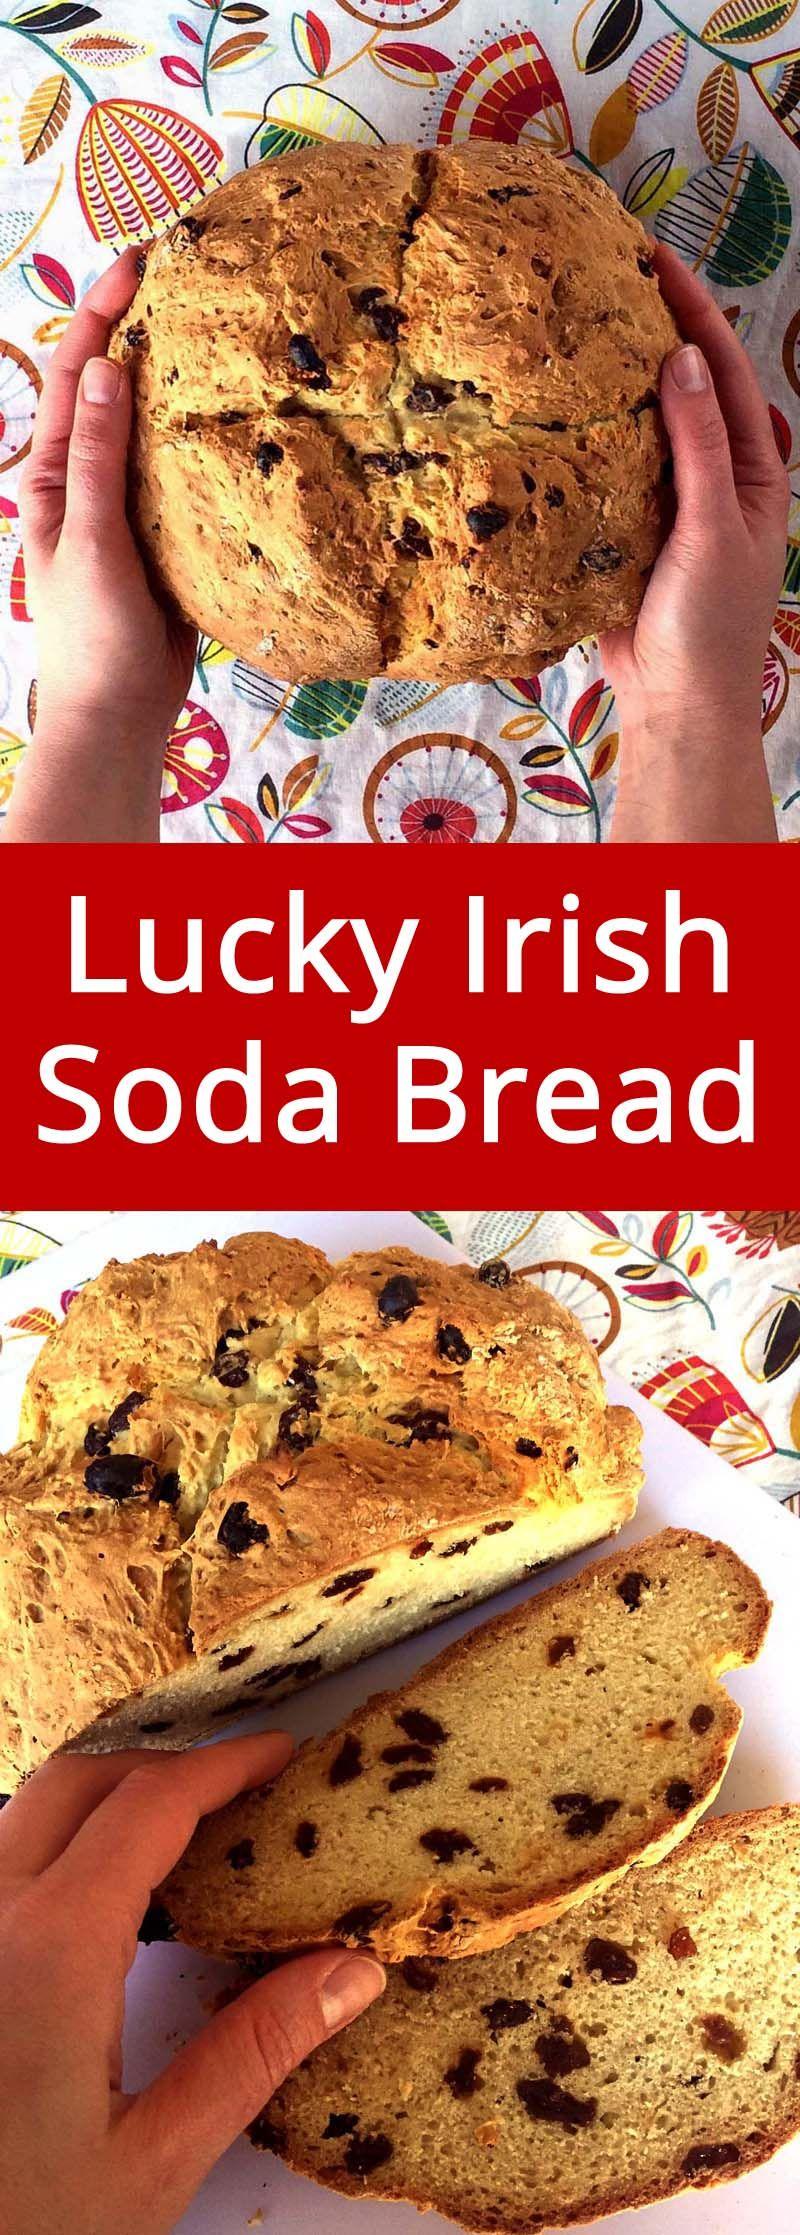 Easy Irish Soda Bread Recipe With Raisins No Buttermilk Needed Recipe Soda Bread Irish Soda Bread Irish Soda